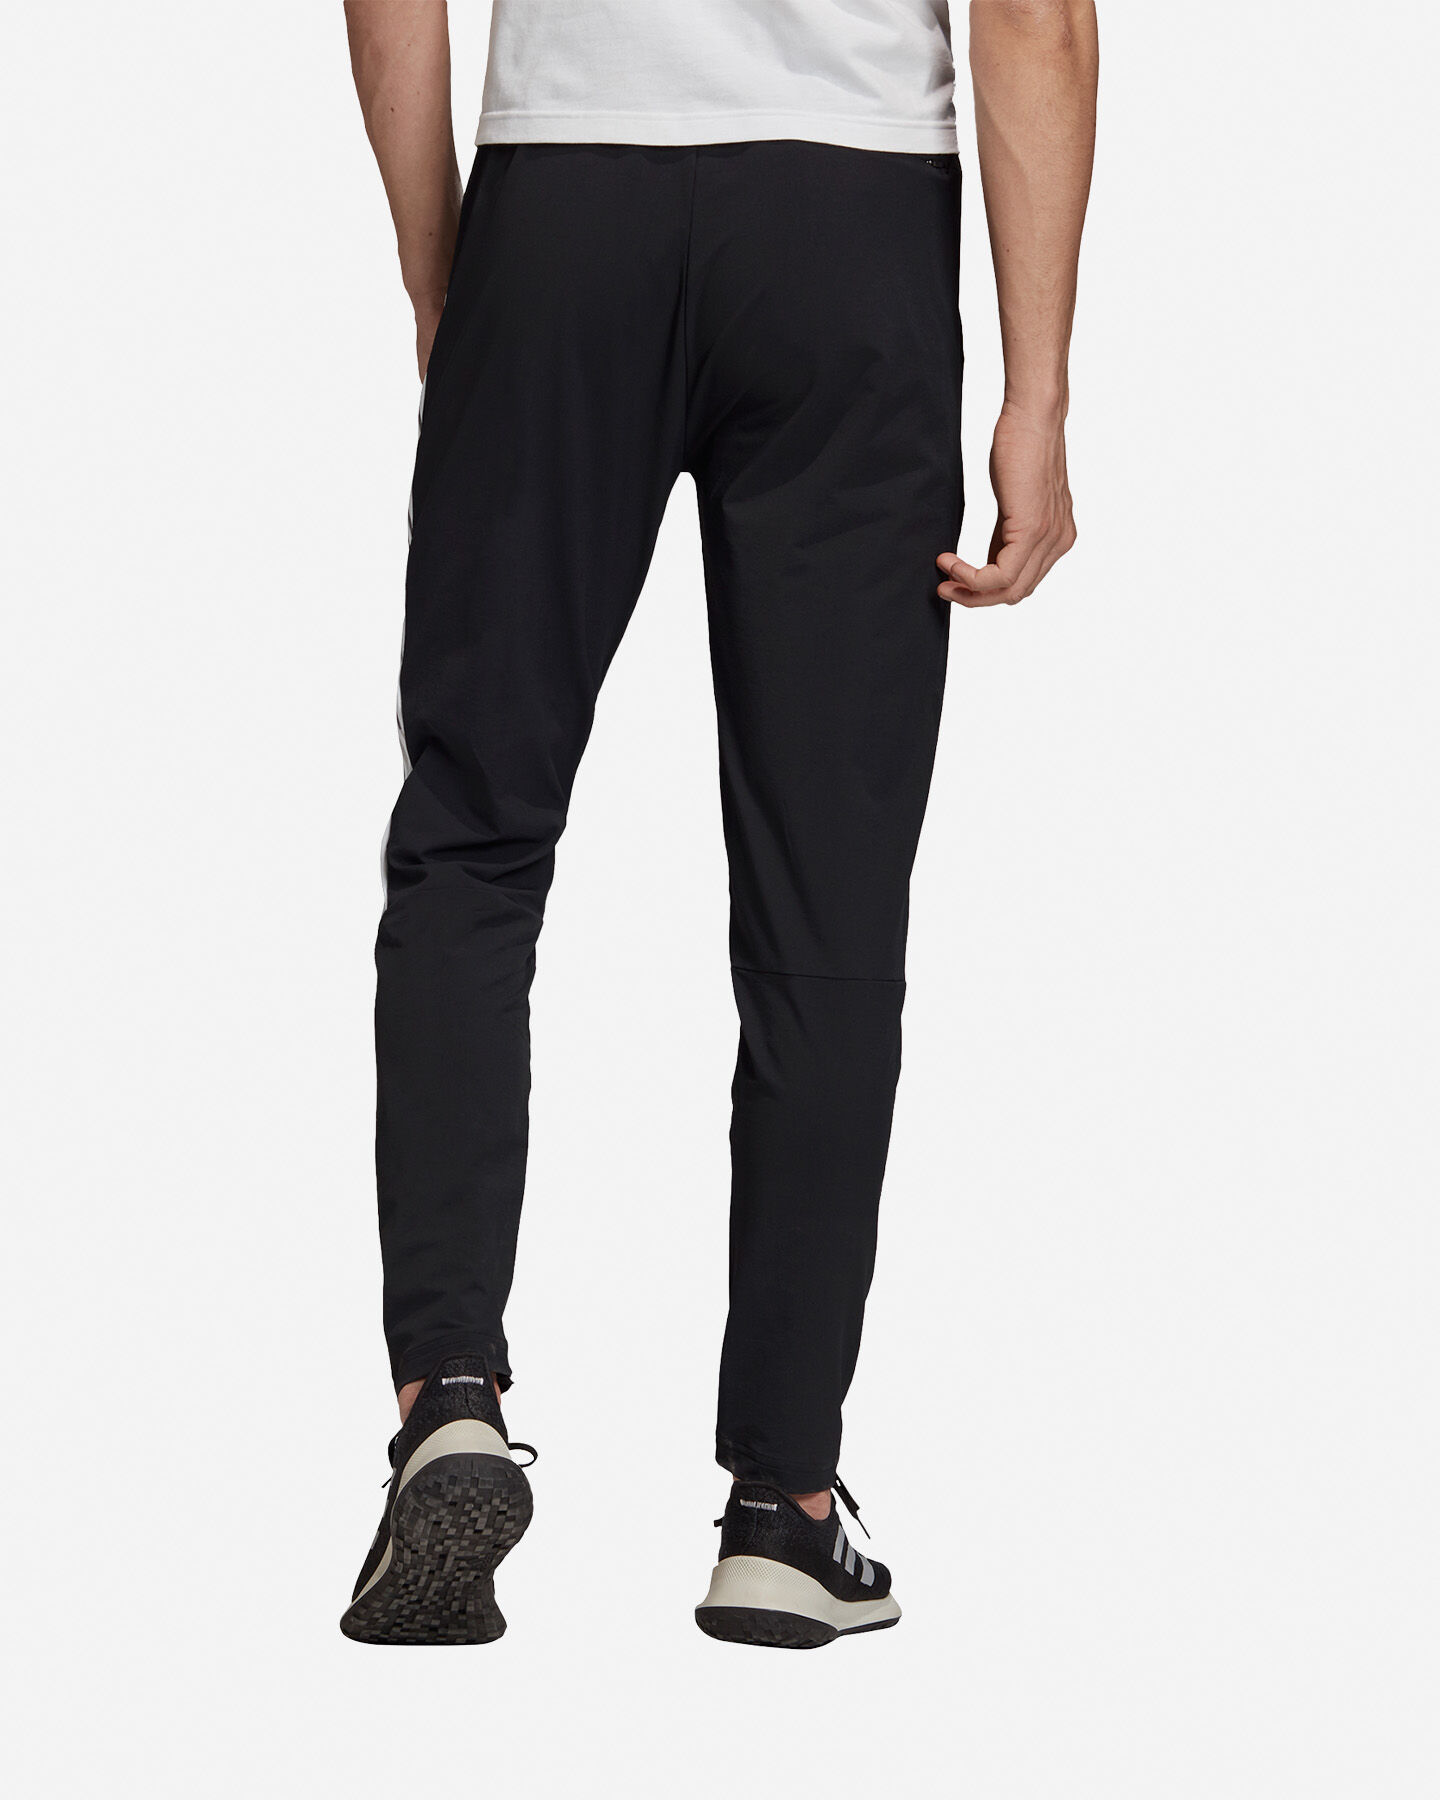 Pantalone ADIDAS Z.N.E. M S5153853 scatto 4